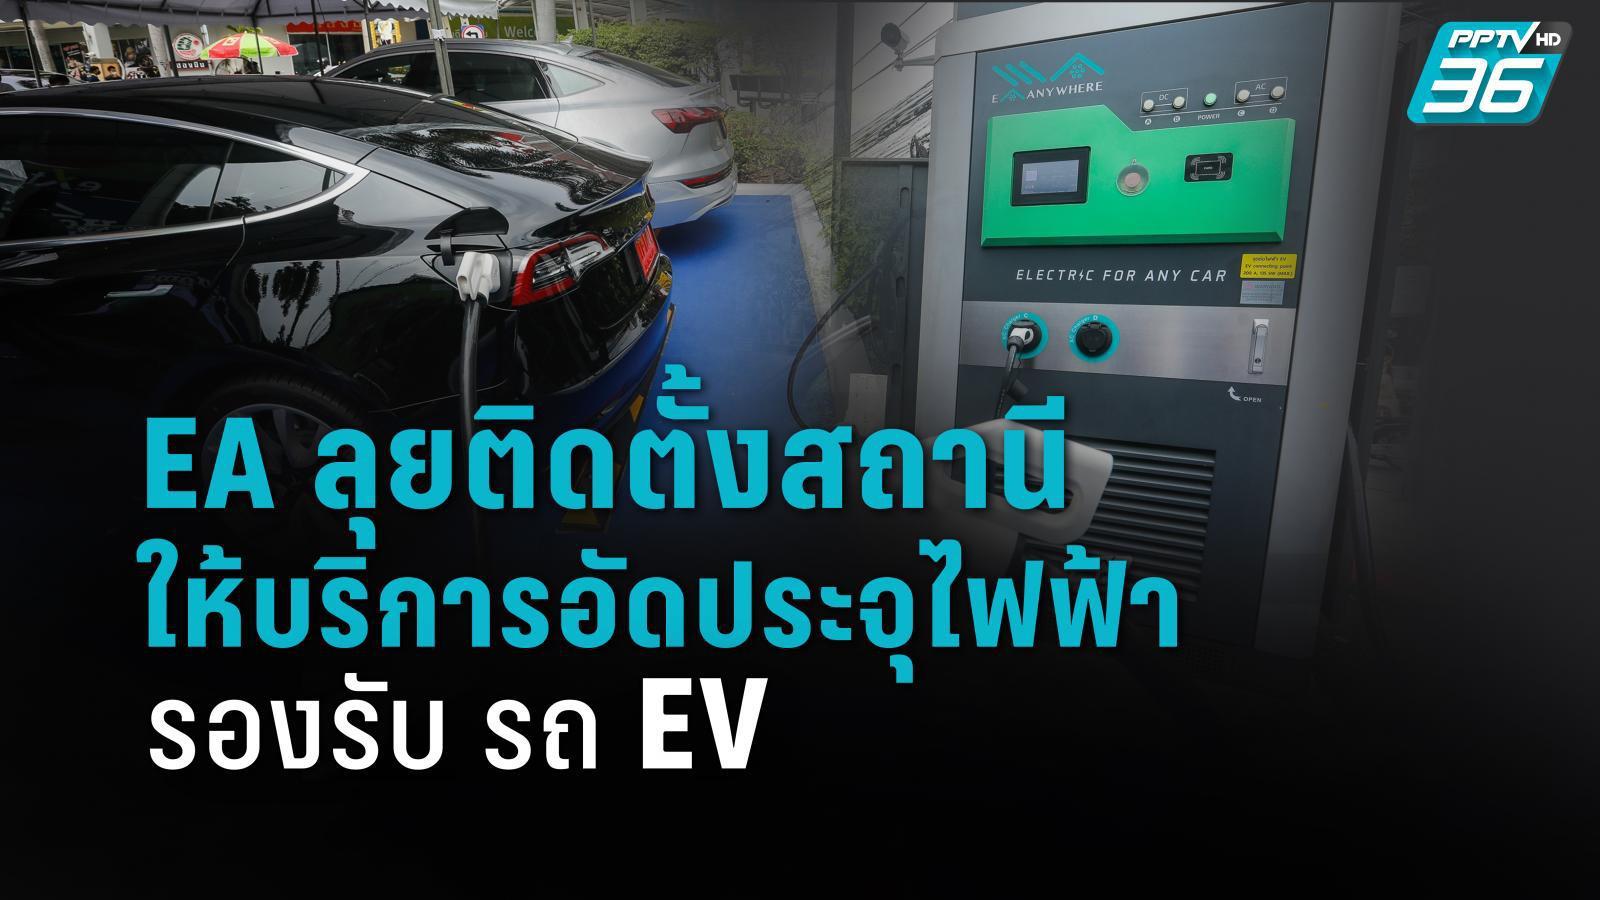 EA ลุย ติดตั้งสถานีอัดประจุไฟฟ้า เตรียมรับ ยานยนต์ไฟฟ้าในอนาคต